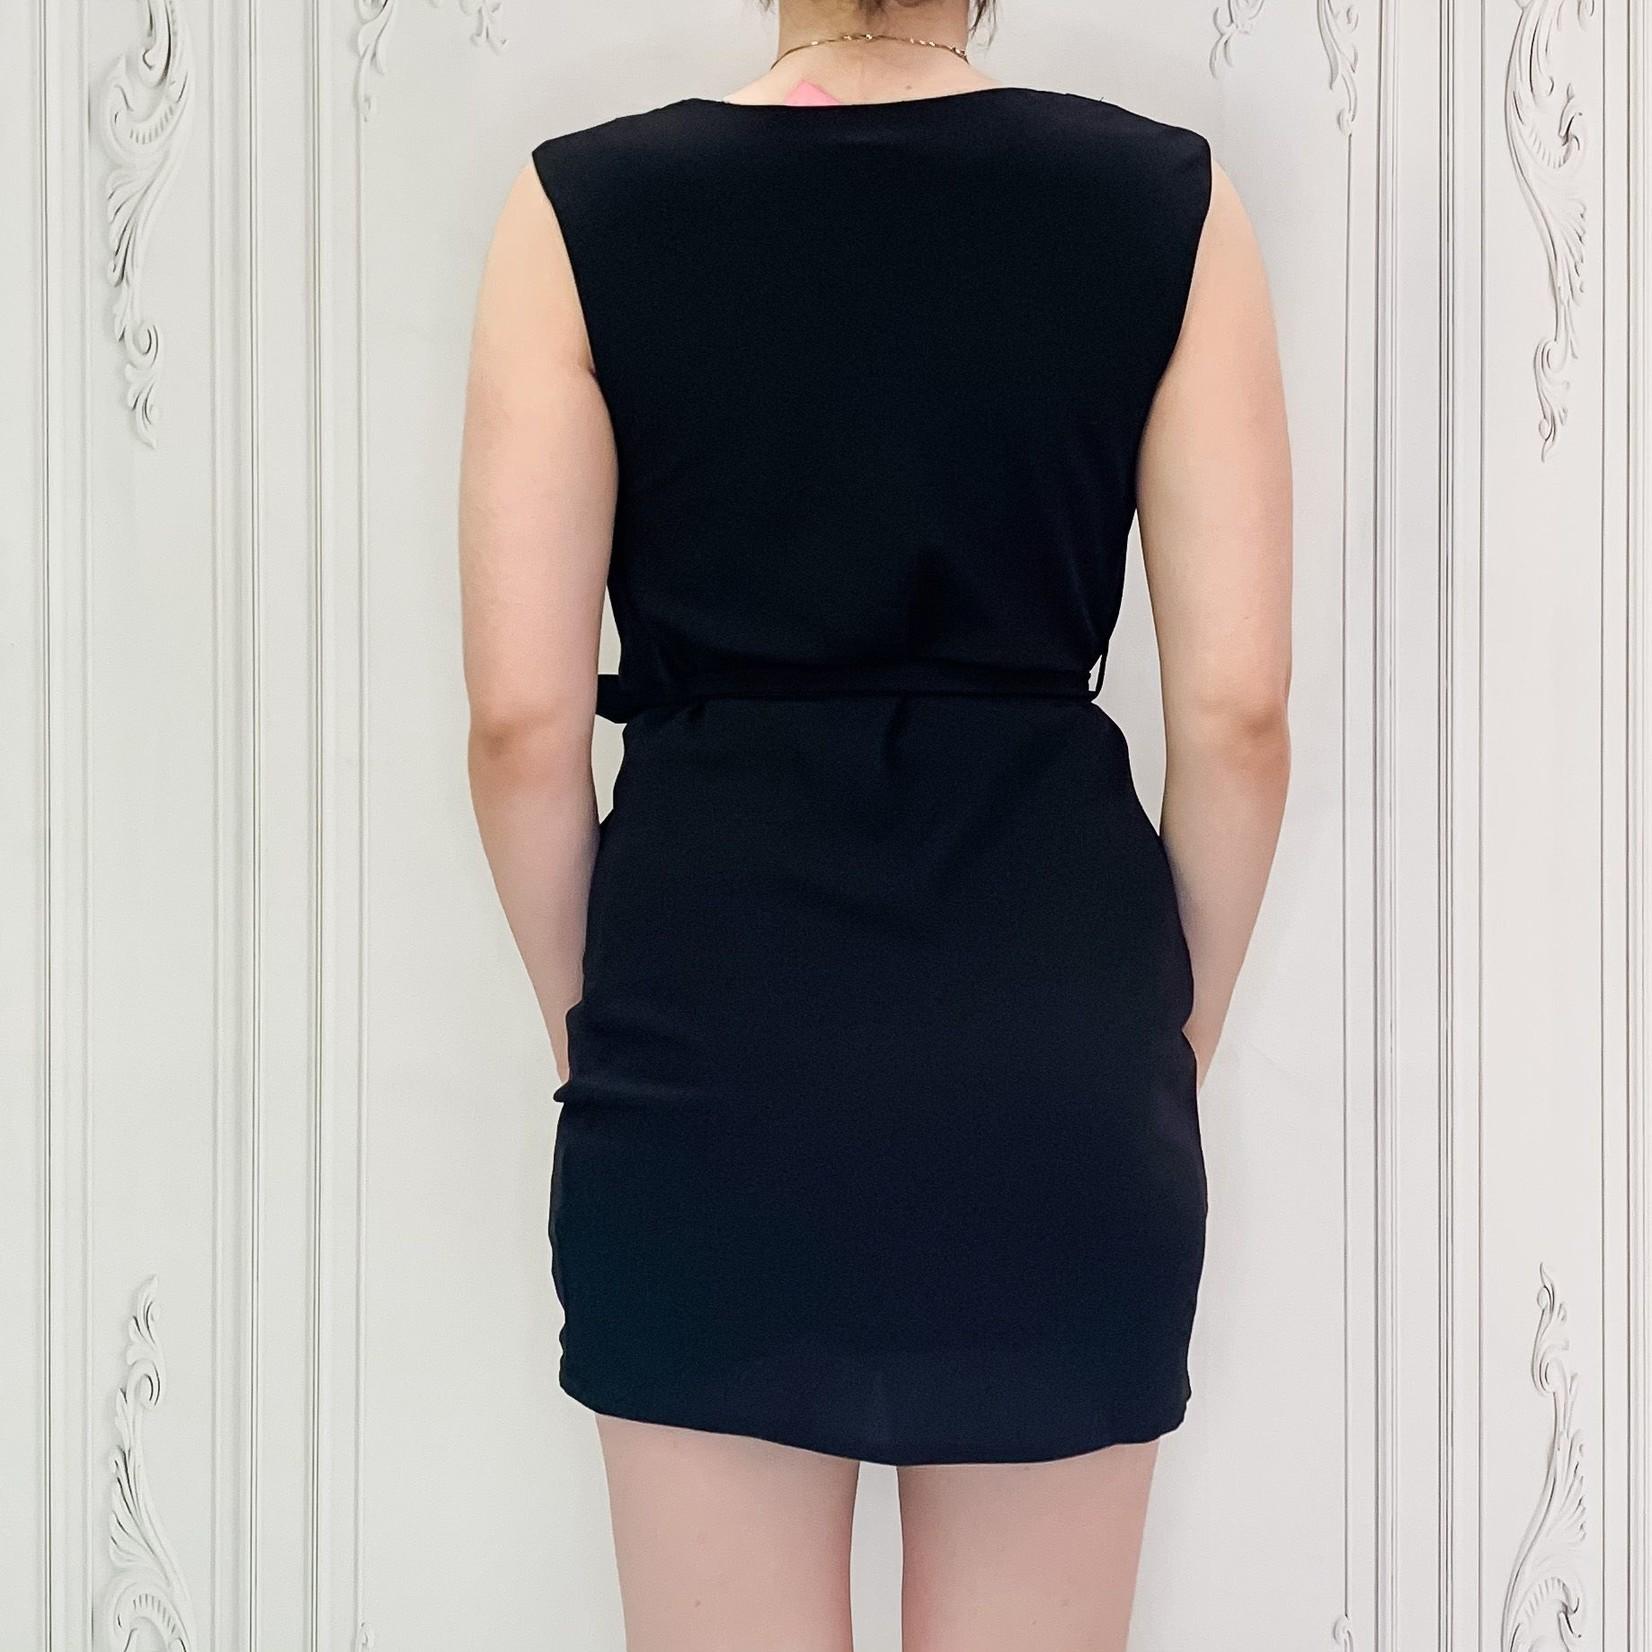 cowl neck dress w/ sash